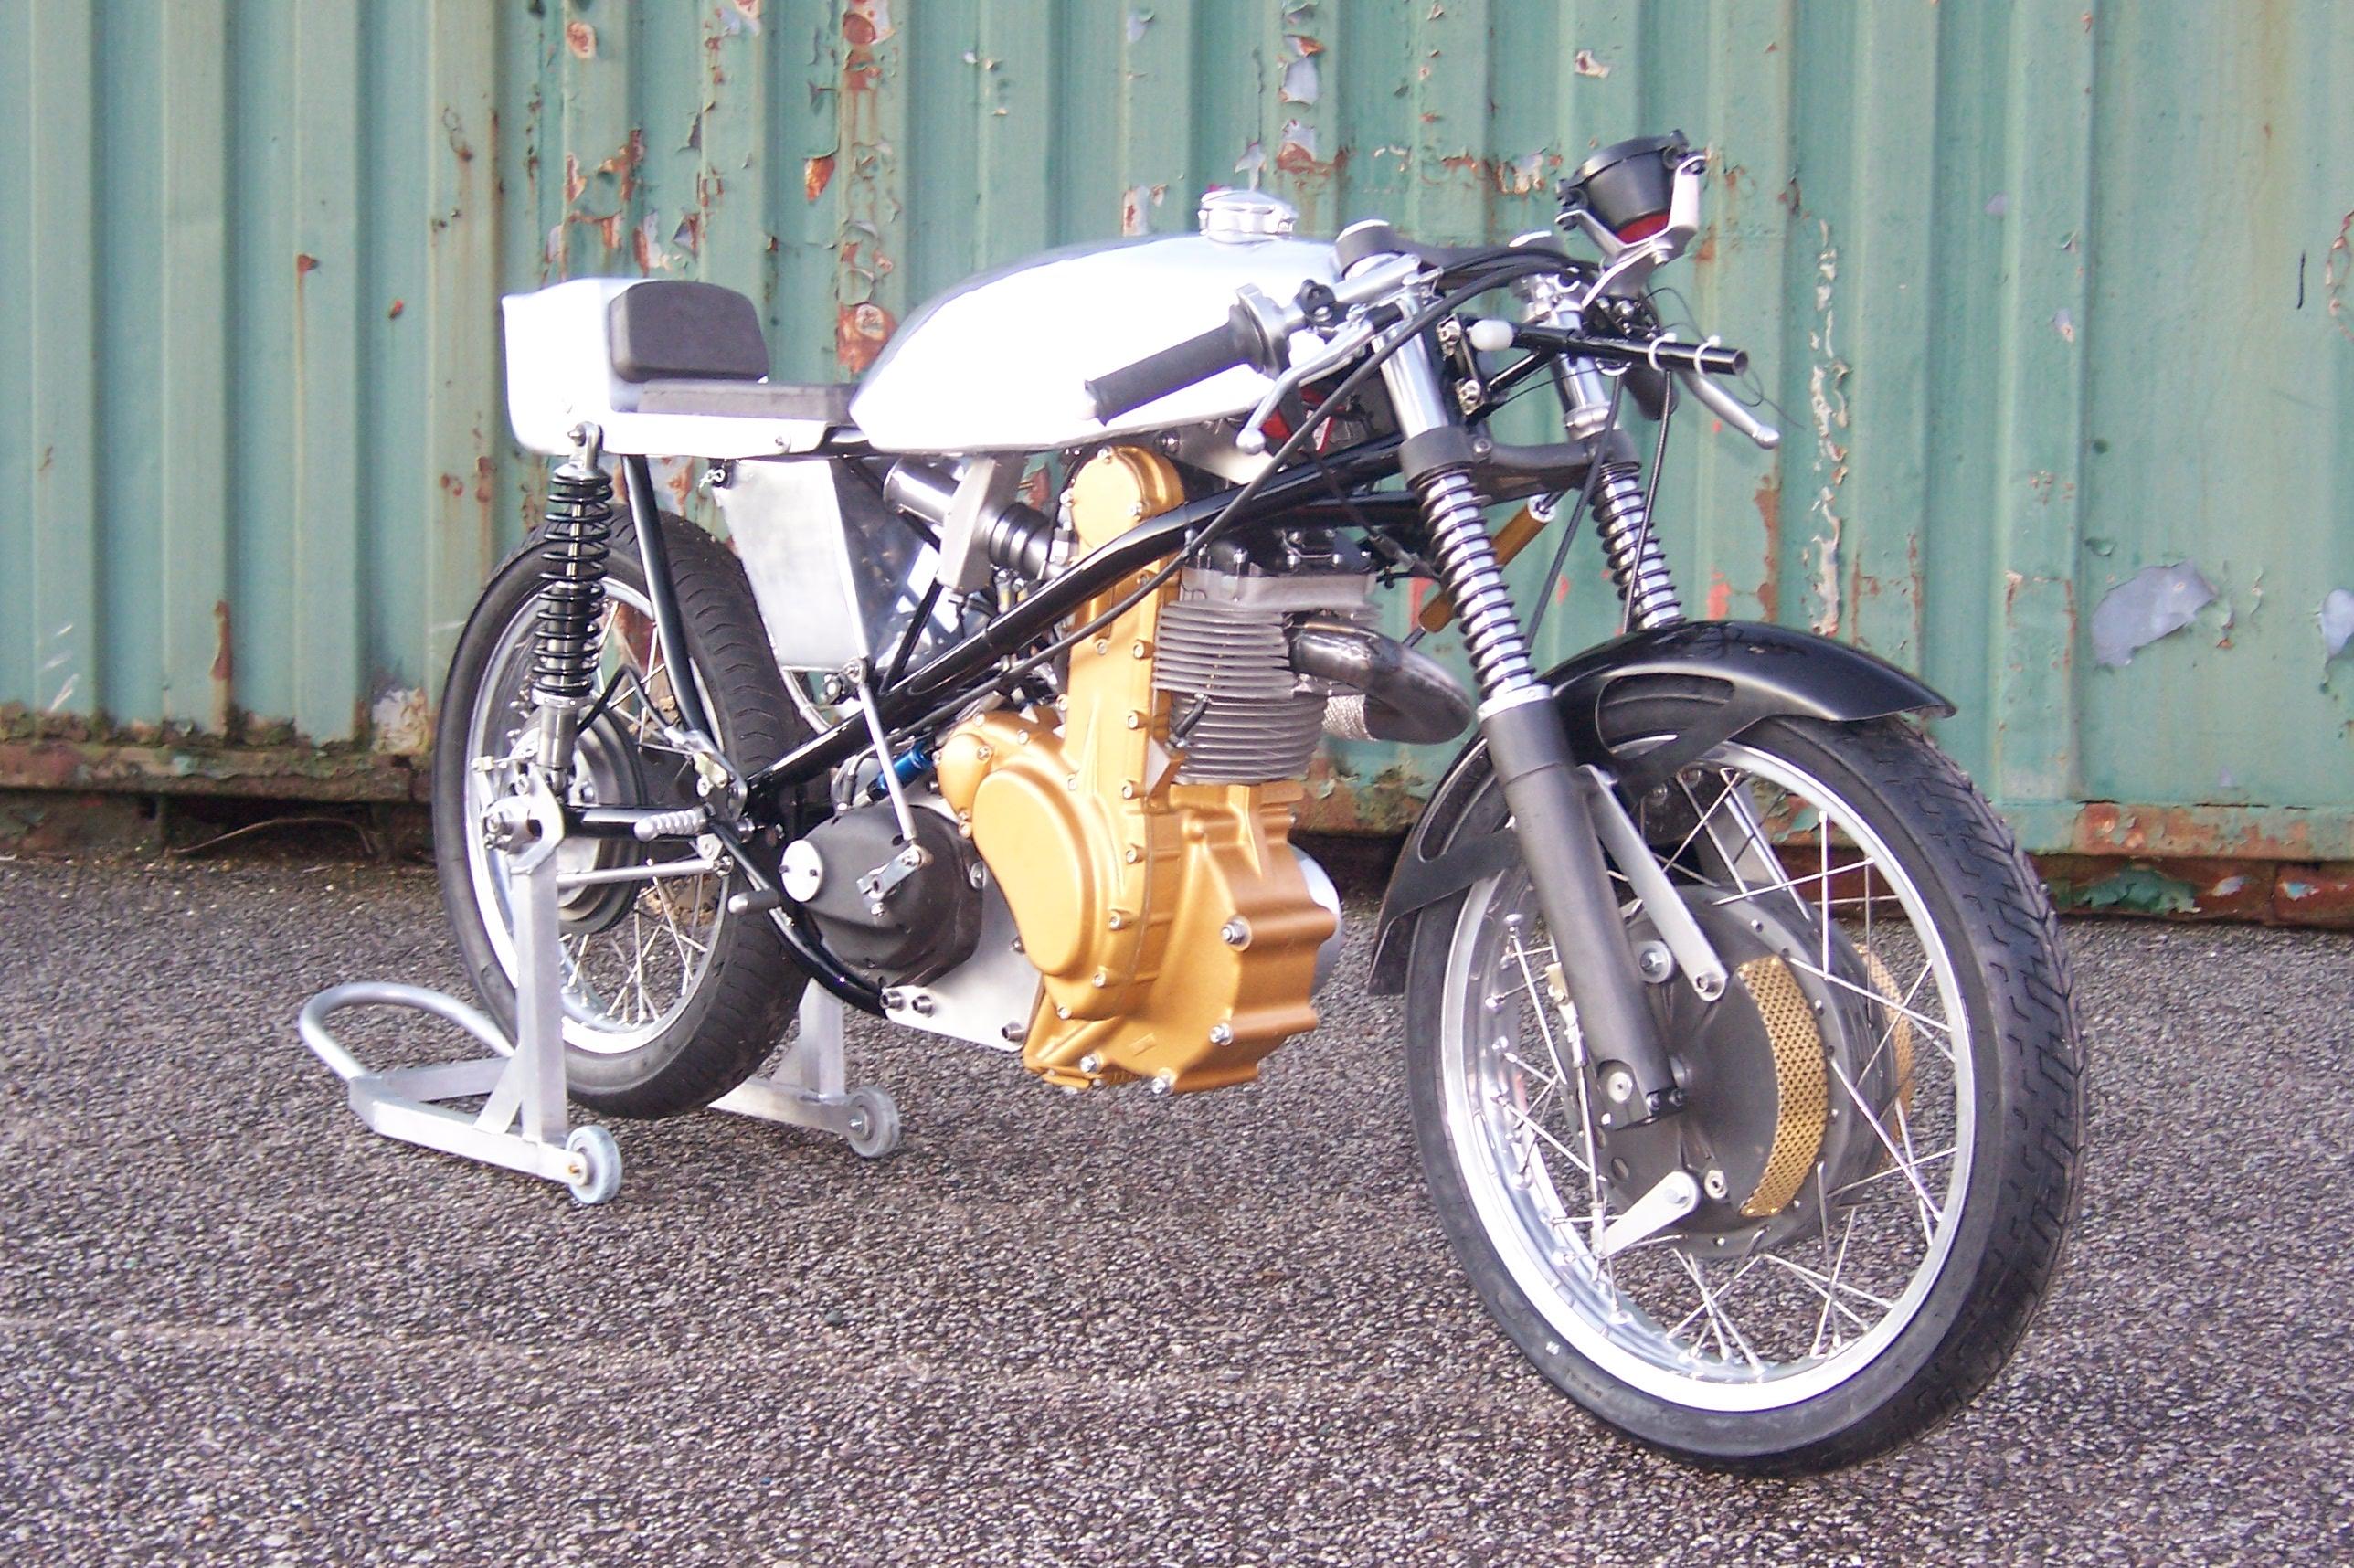 Seeley MK4 G50 - BSR Replica